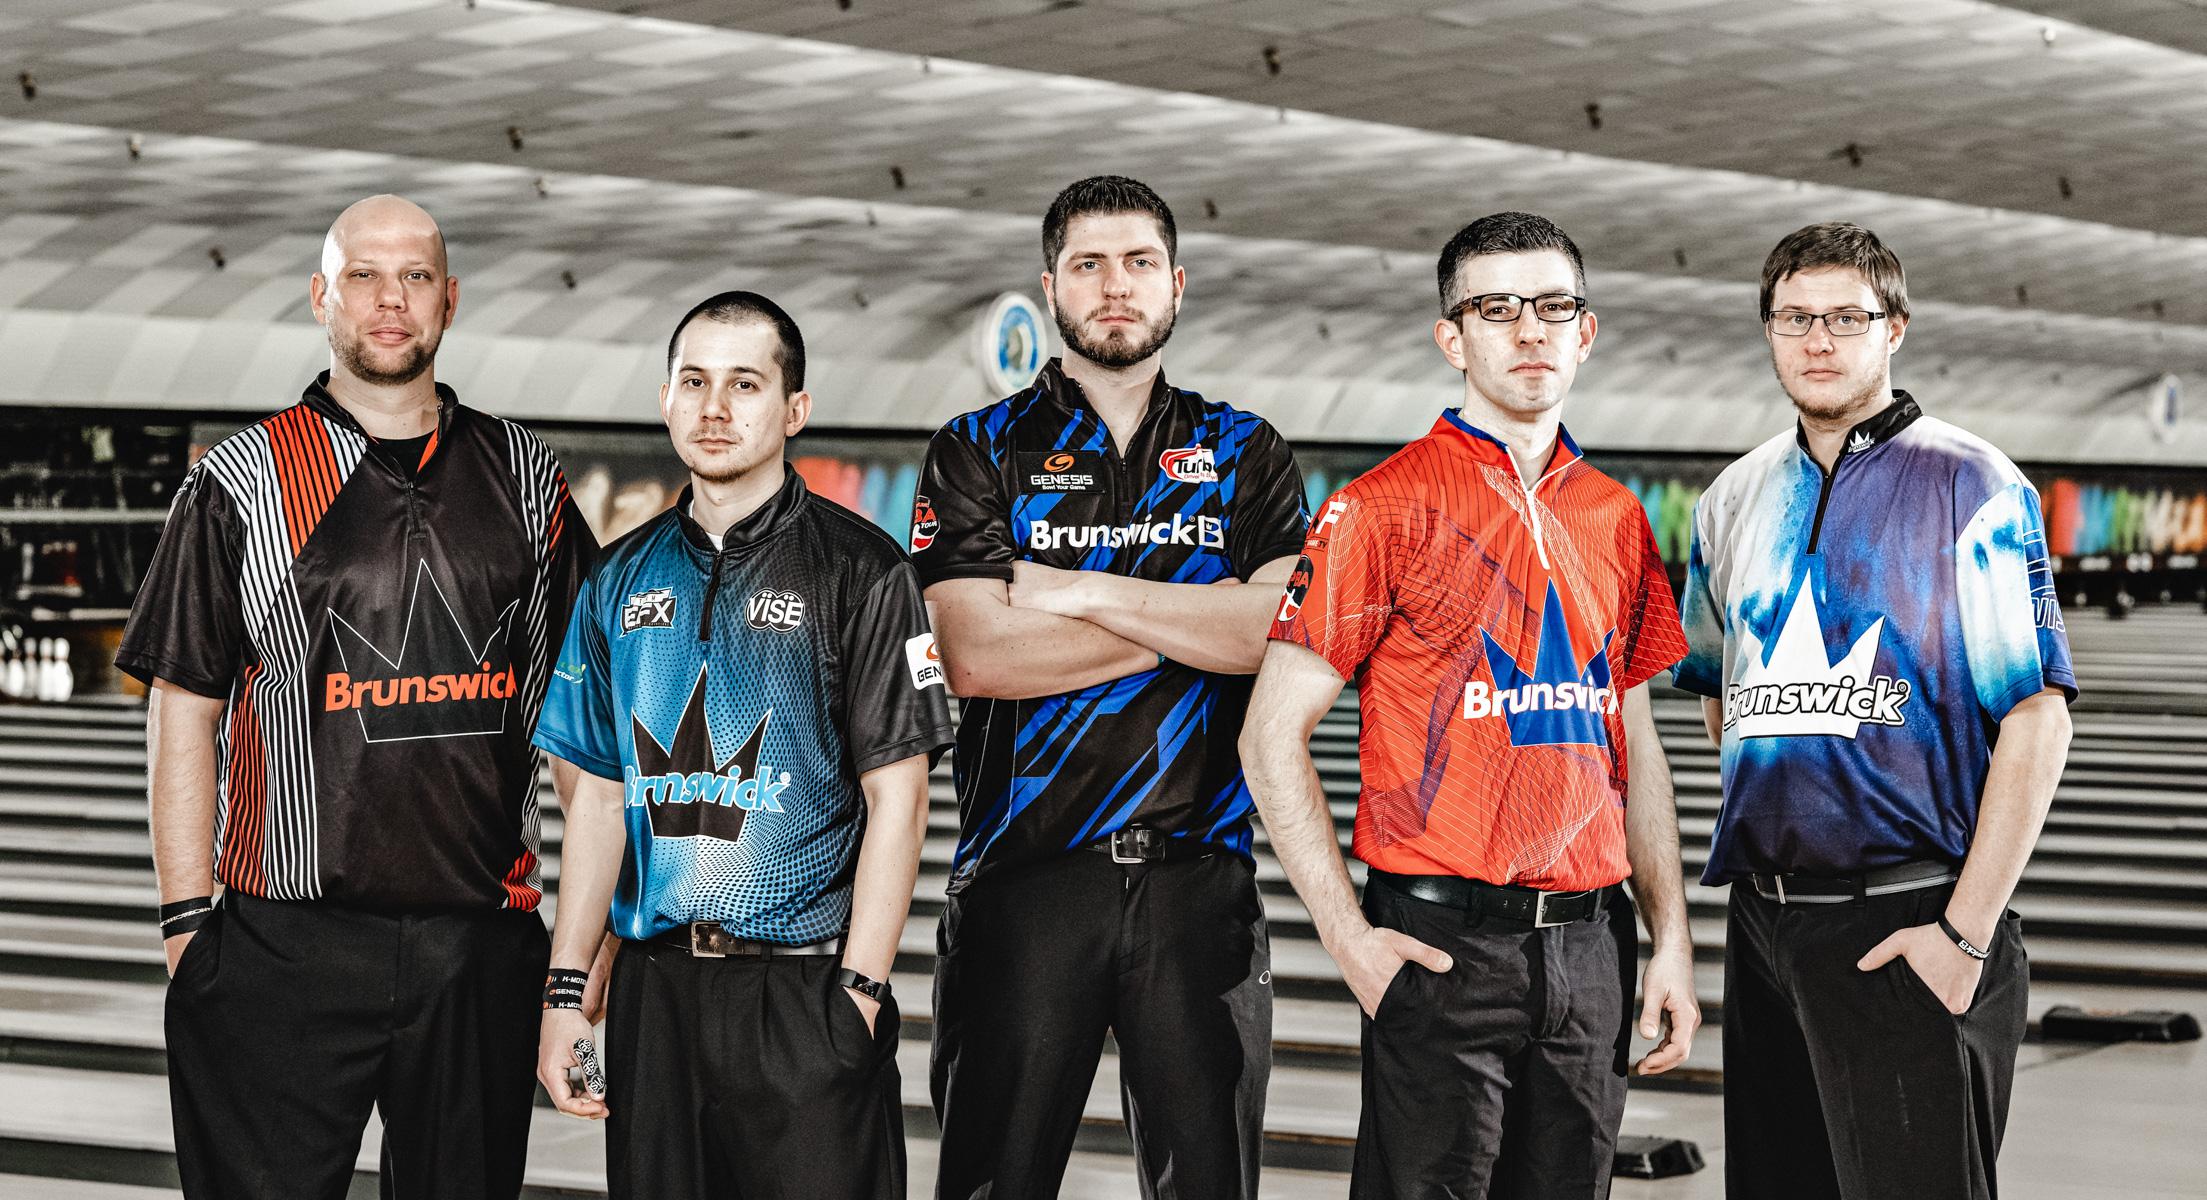 bowling-professional-photos-120.jpg